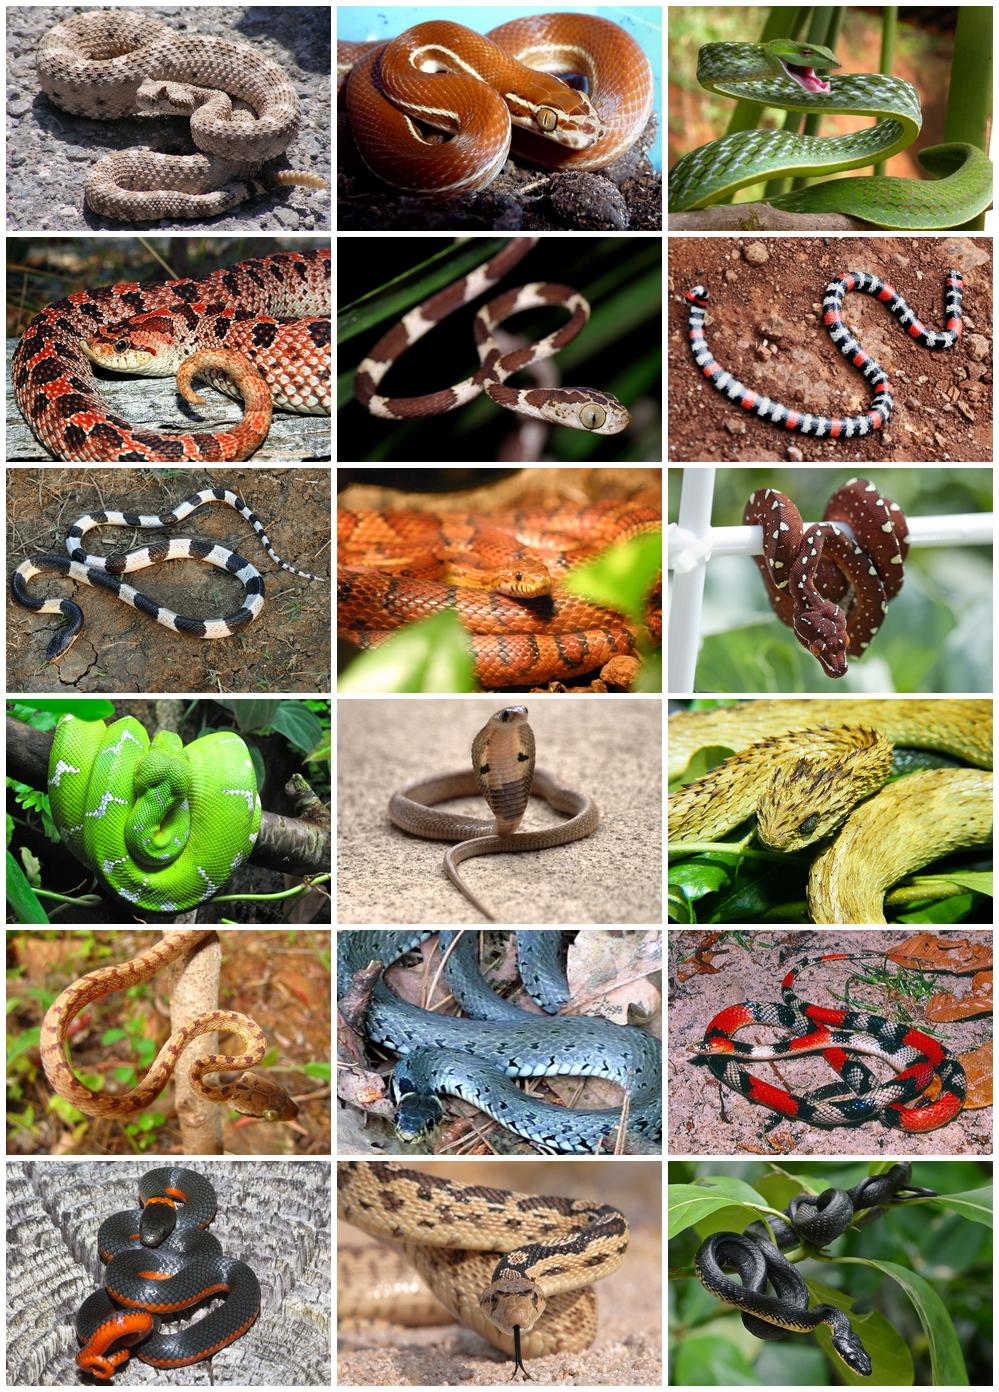 http://upload.wikimedia.org/wikipedia/commons/f/f5/Snakes_Diversity.jpg?uselang=fr